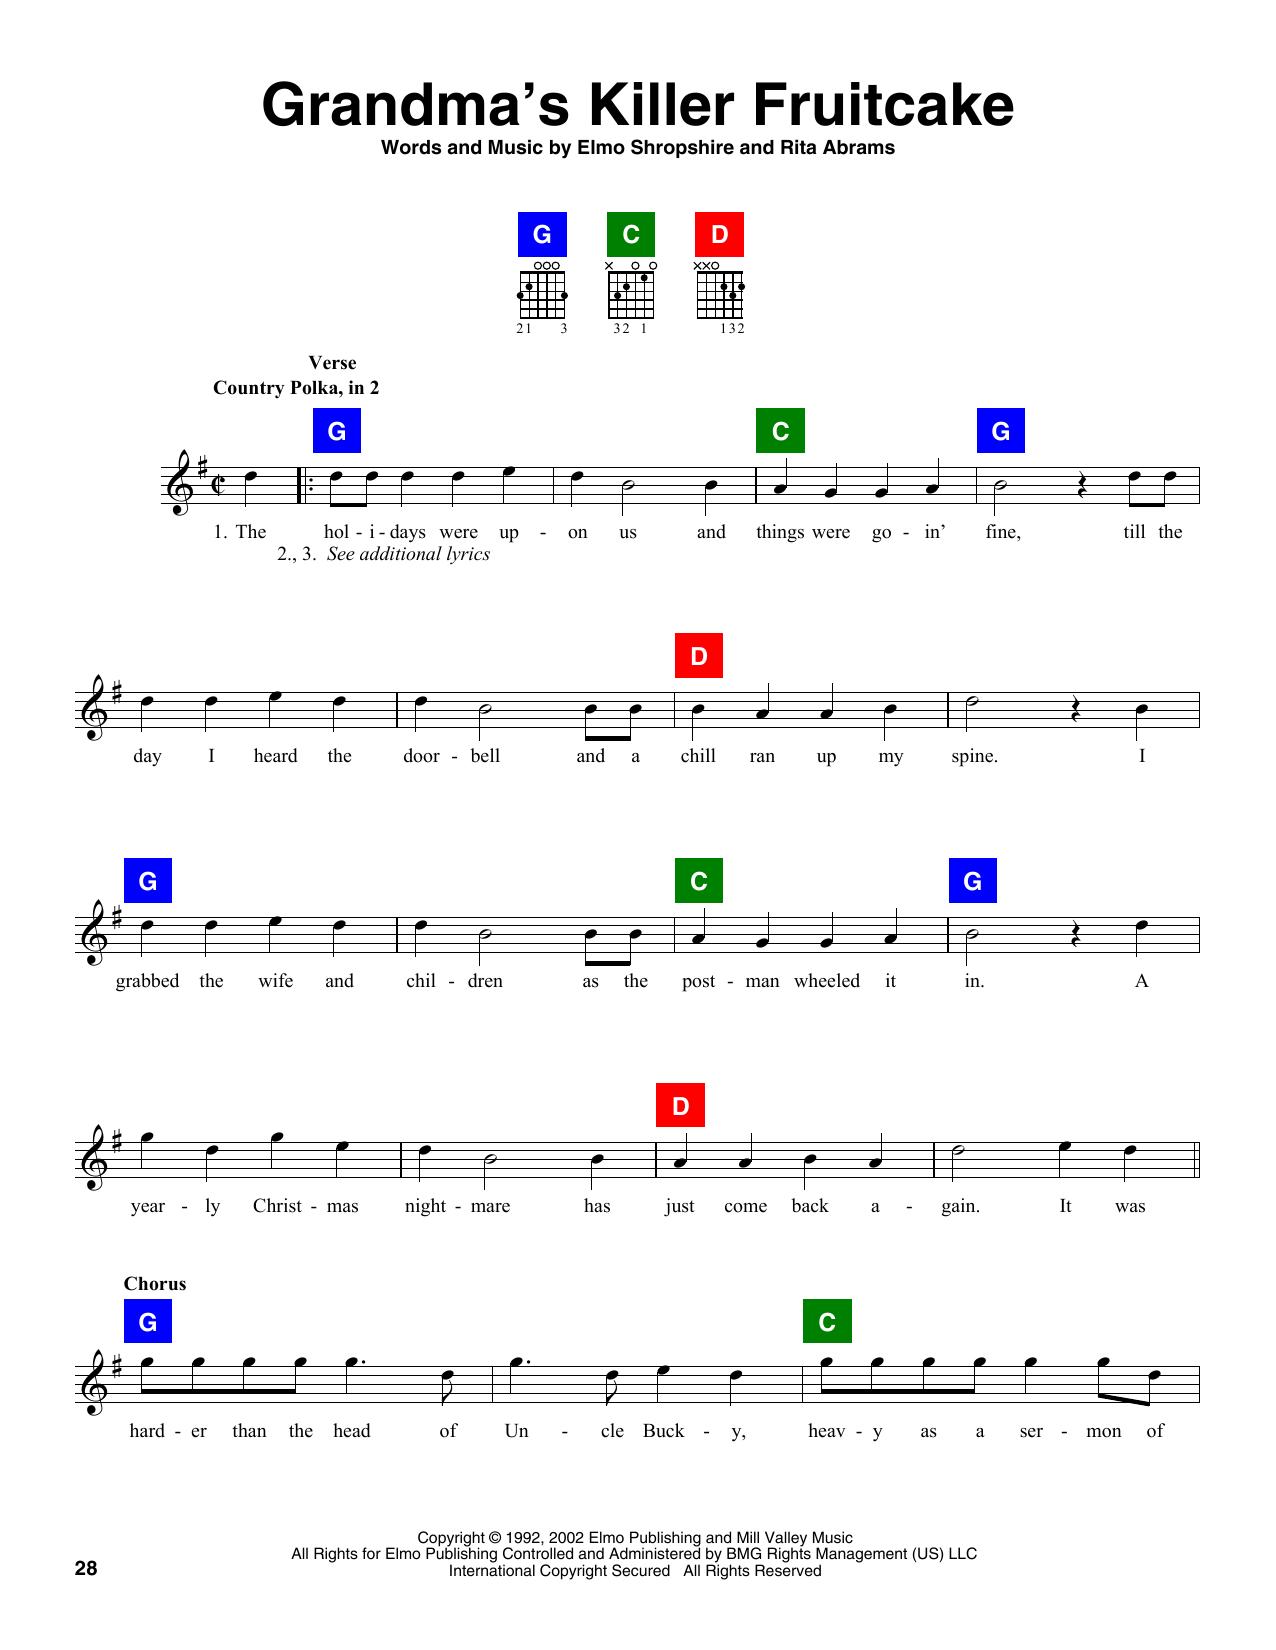 Elmo Shropshire Grandma's Killer Fruitcake sheet music notes and chords